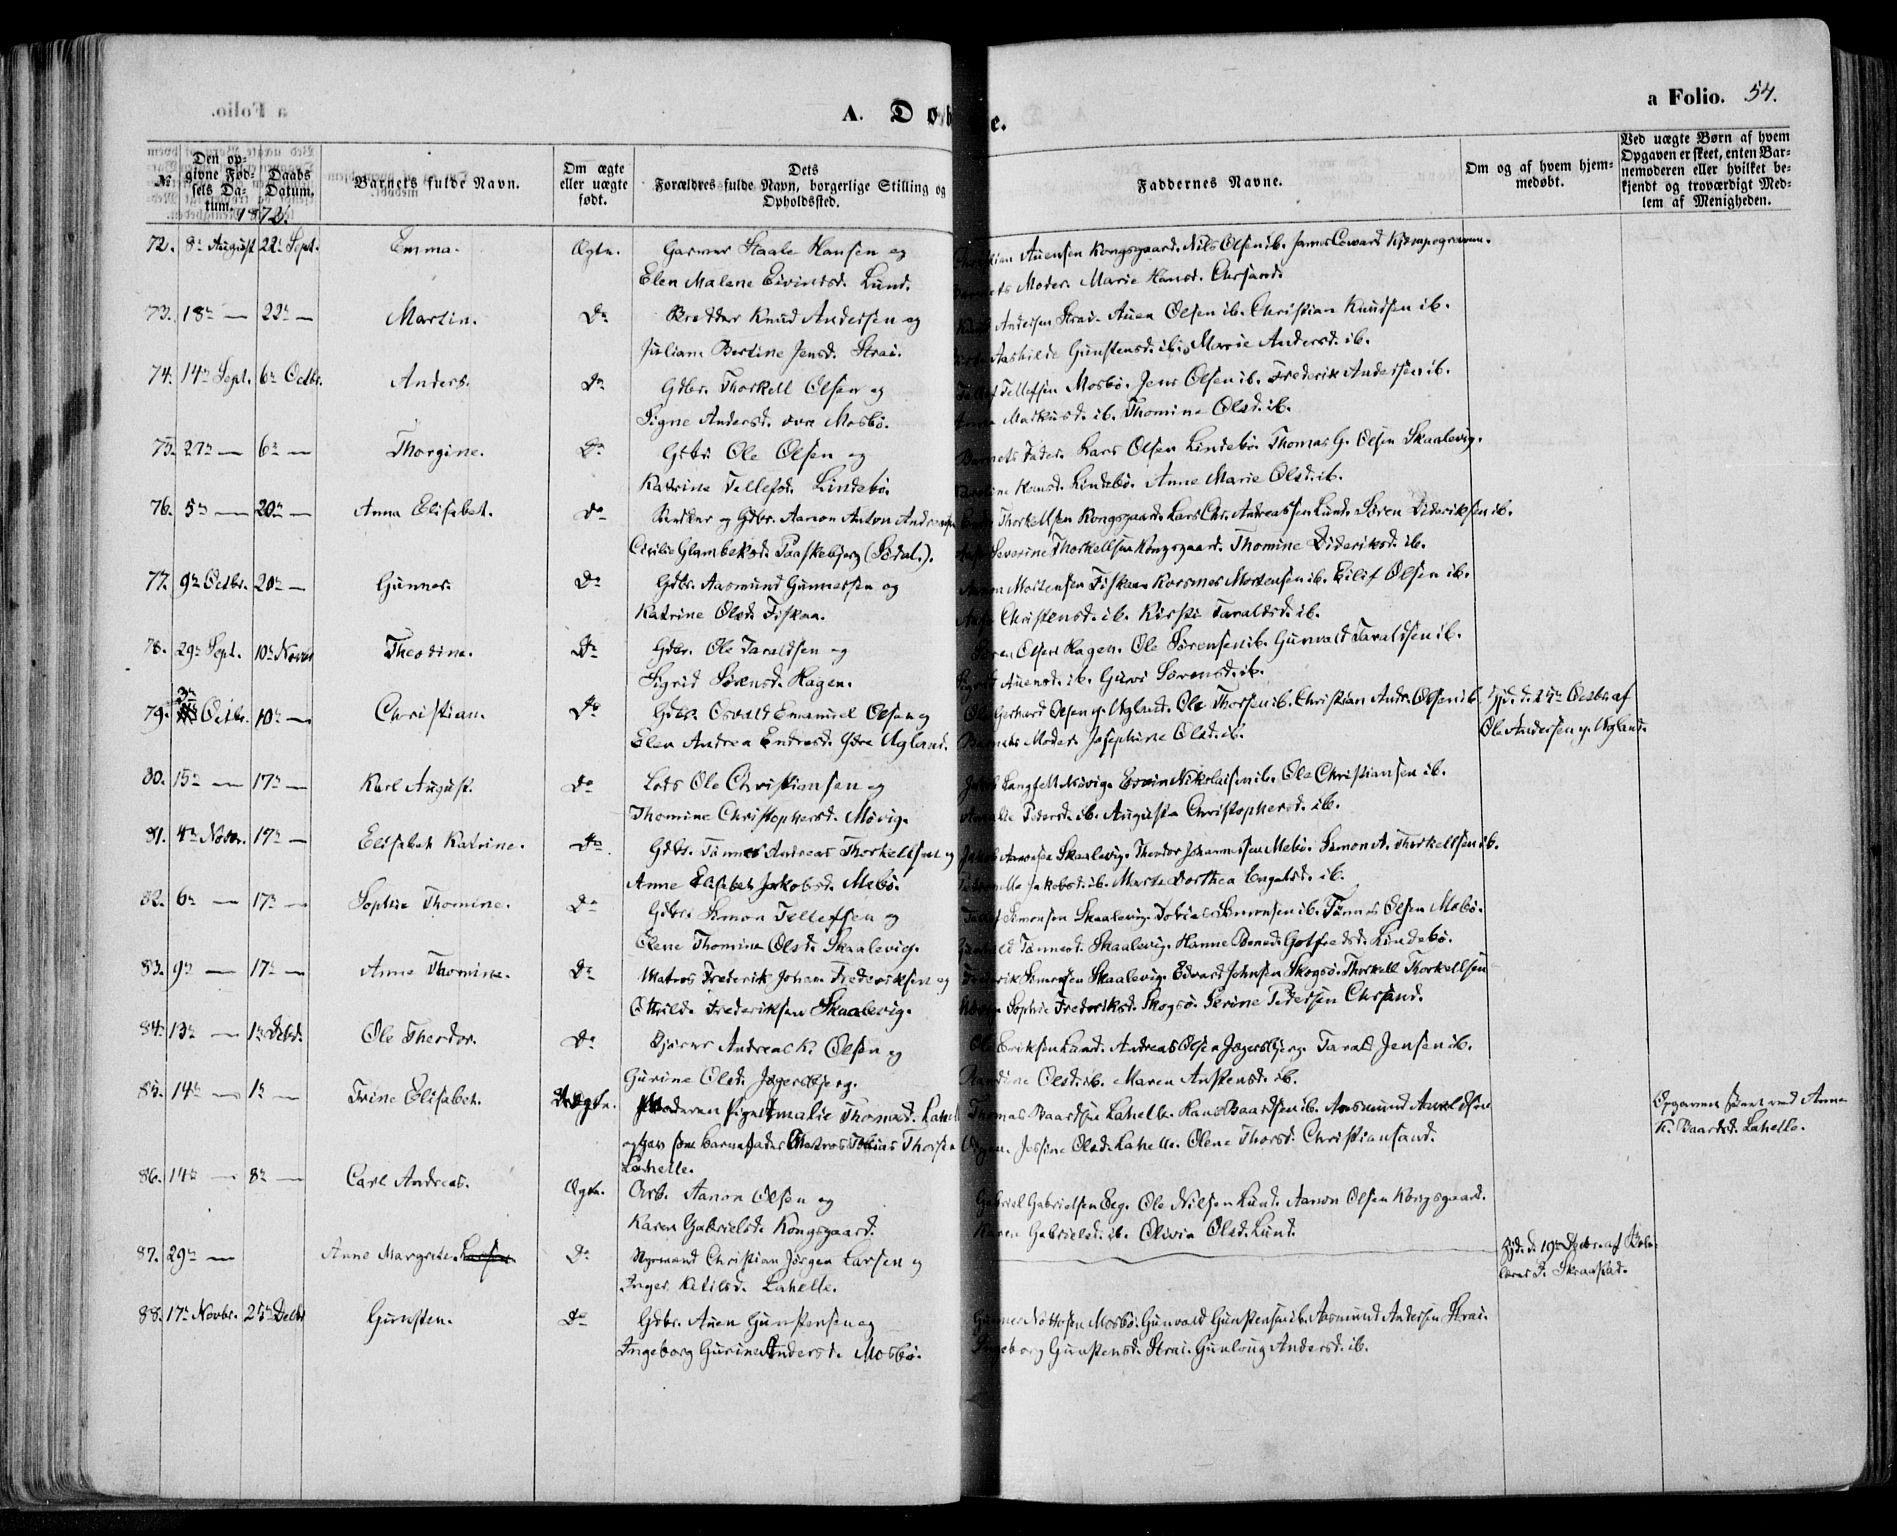 SAK, Oddernes sokneprestkontor, F/Fa/Faa/L0008: Ministerialbok nr. A 8, 1864-1880, s. 54